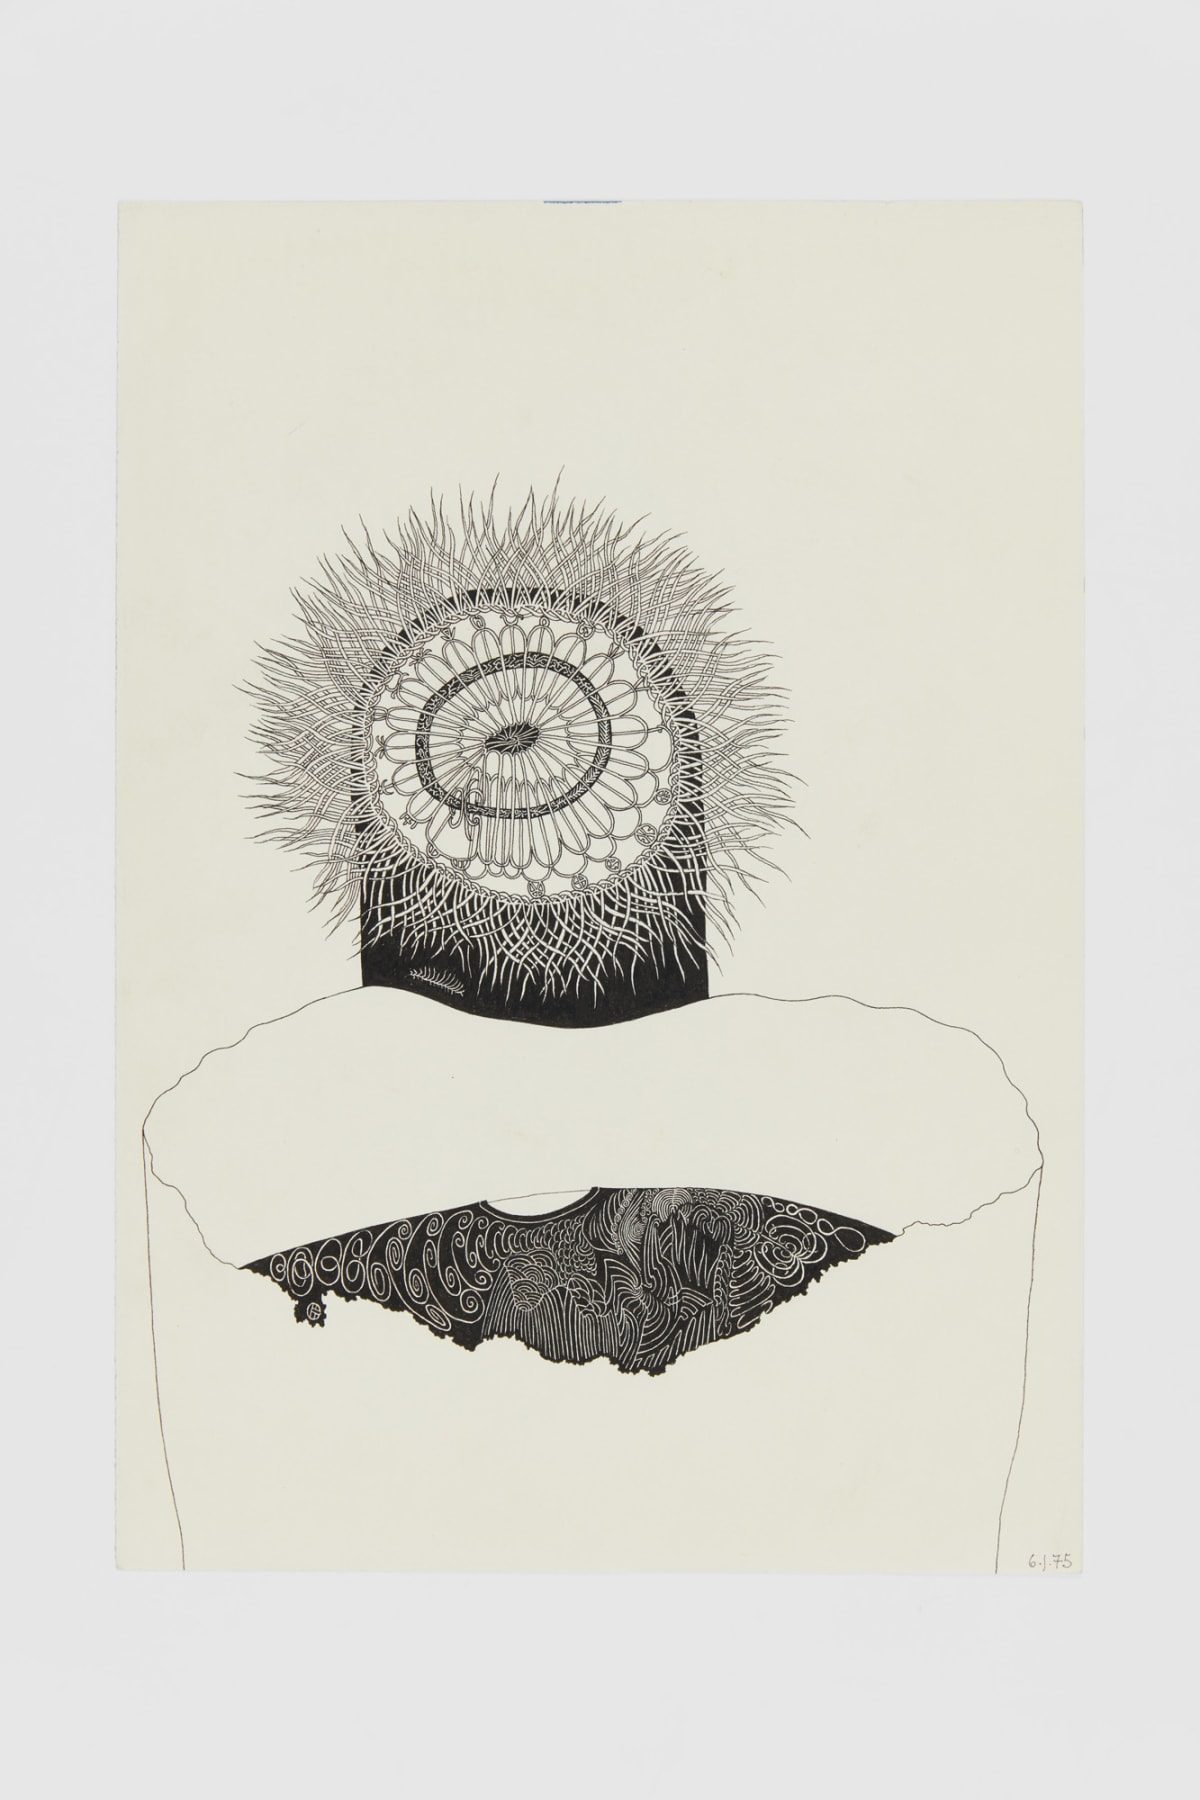 Ann CHURCHILL 6.1.75 (Daily drawings), 1975 Pen on paper 29.7 x 20.9 cm